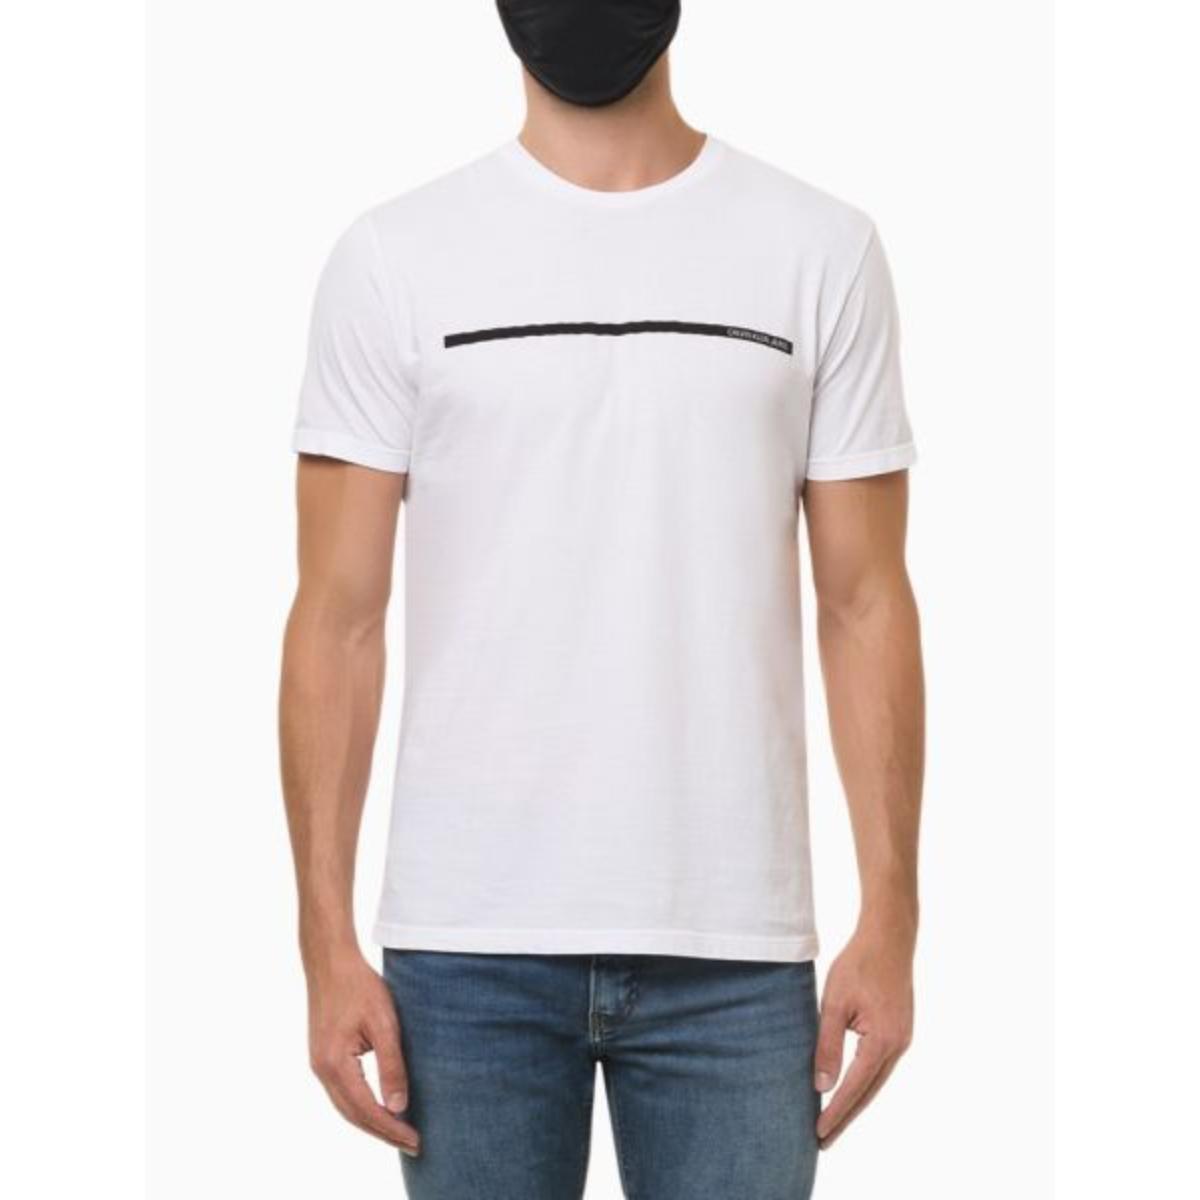 Camiseta Masculina Calvin Klein Ckjm102 Branco